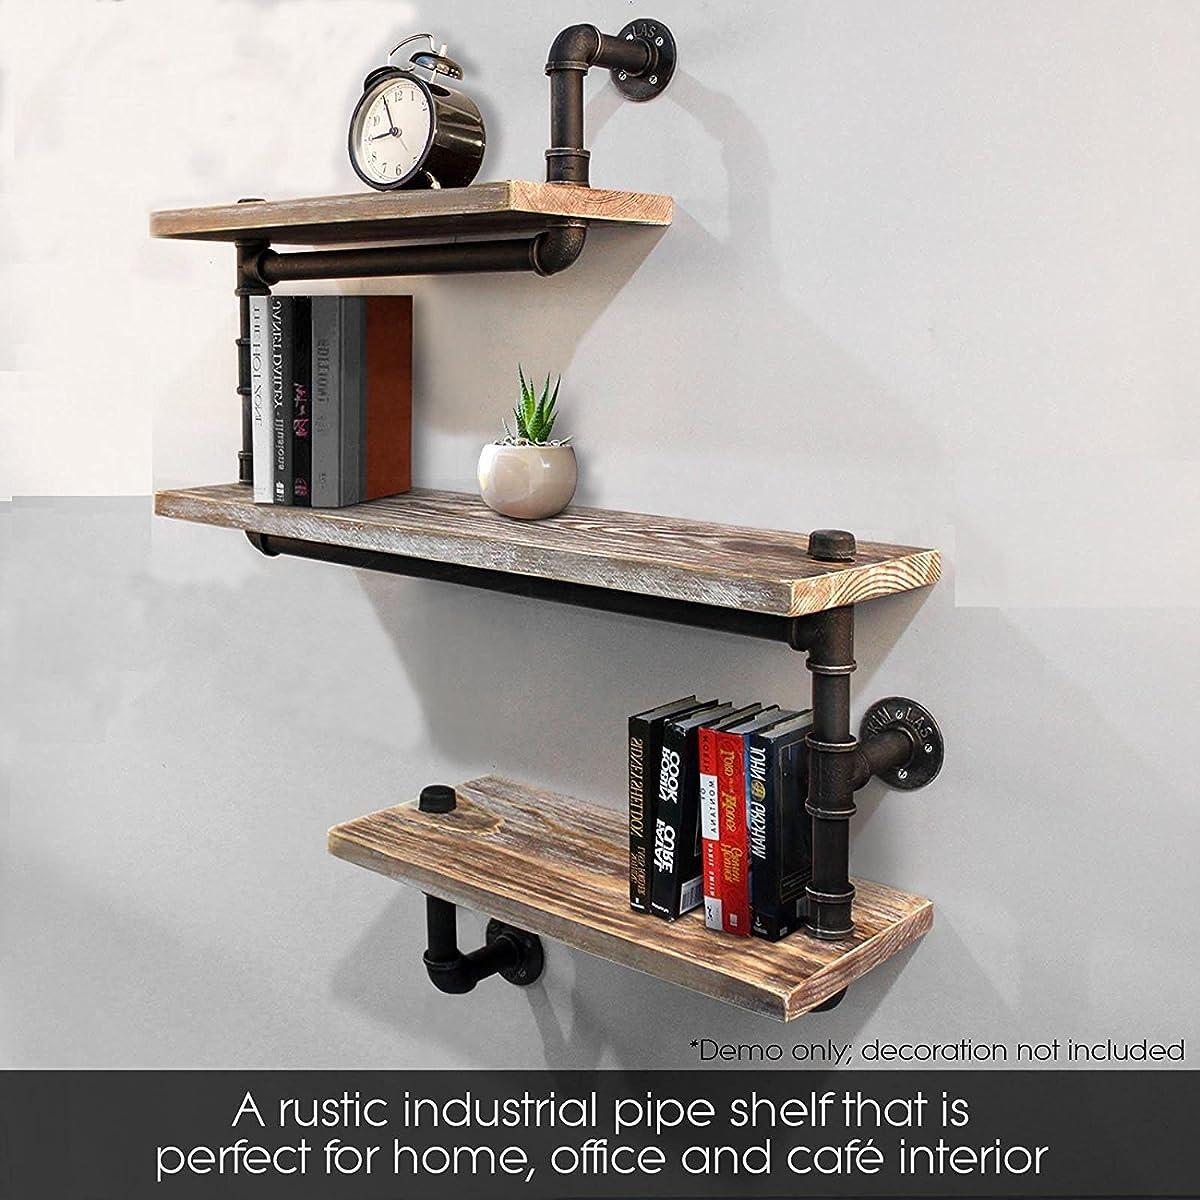 Industrial Pipe Shelving Bookshelf Rustic Modern Wood Ladder Pipe Wall Shelf 3 Tiers Wrought IronPipe Design Bookshelf Diy Shelving